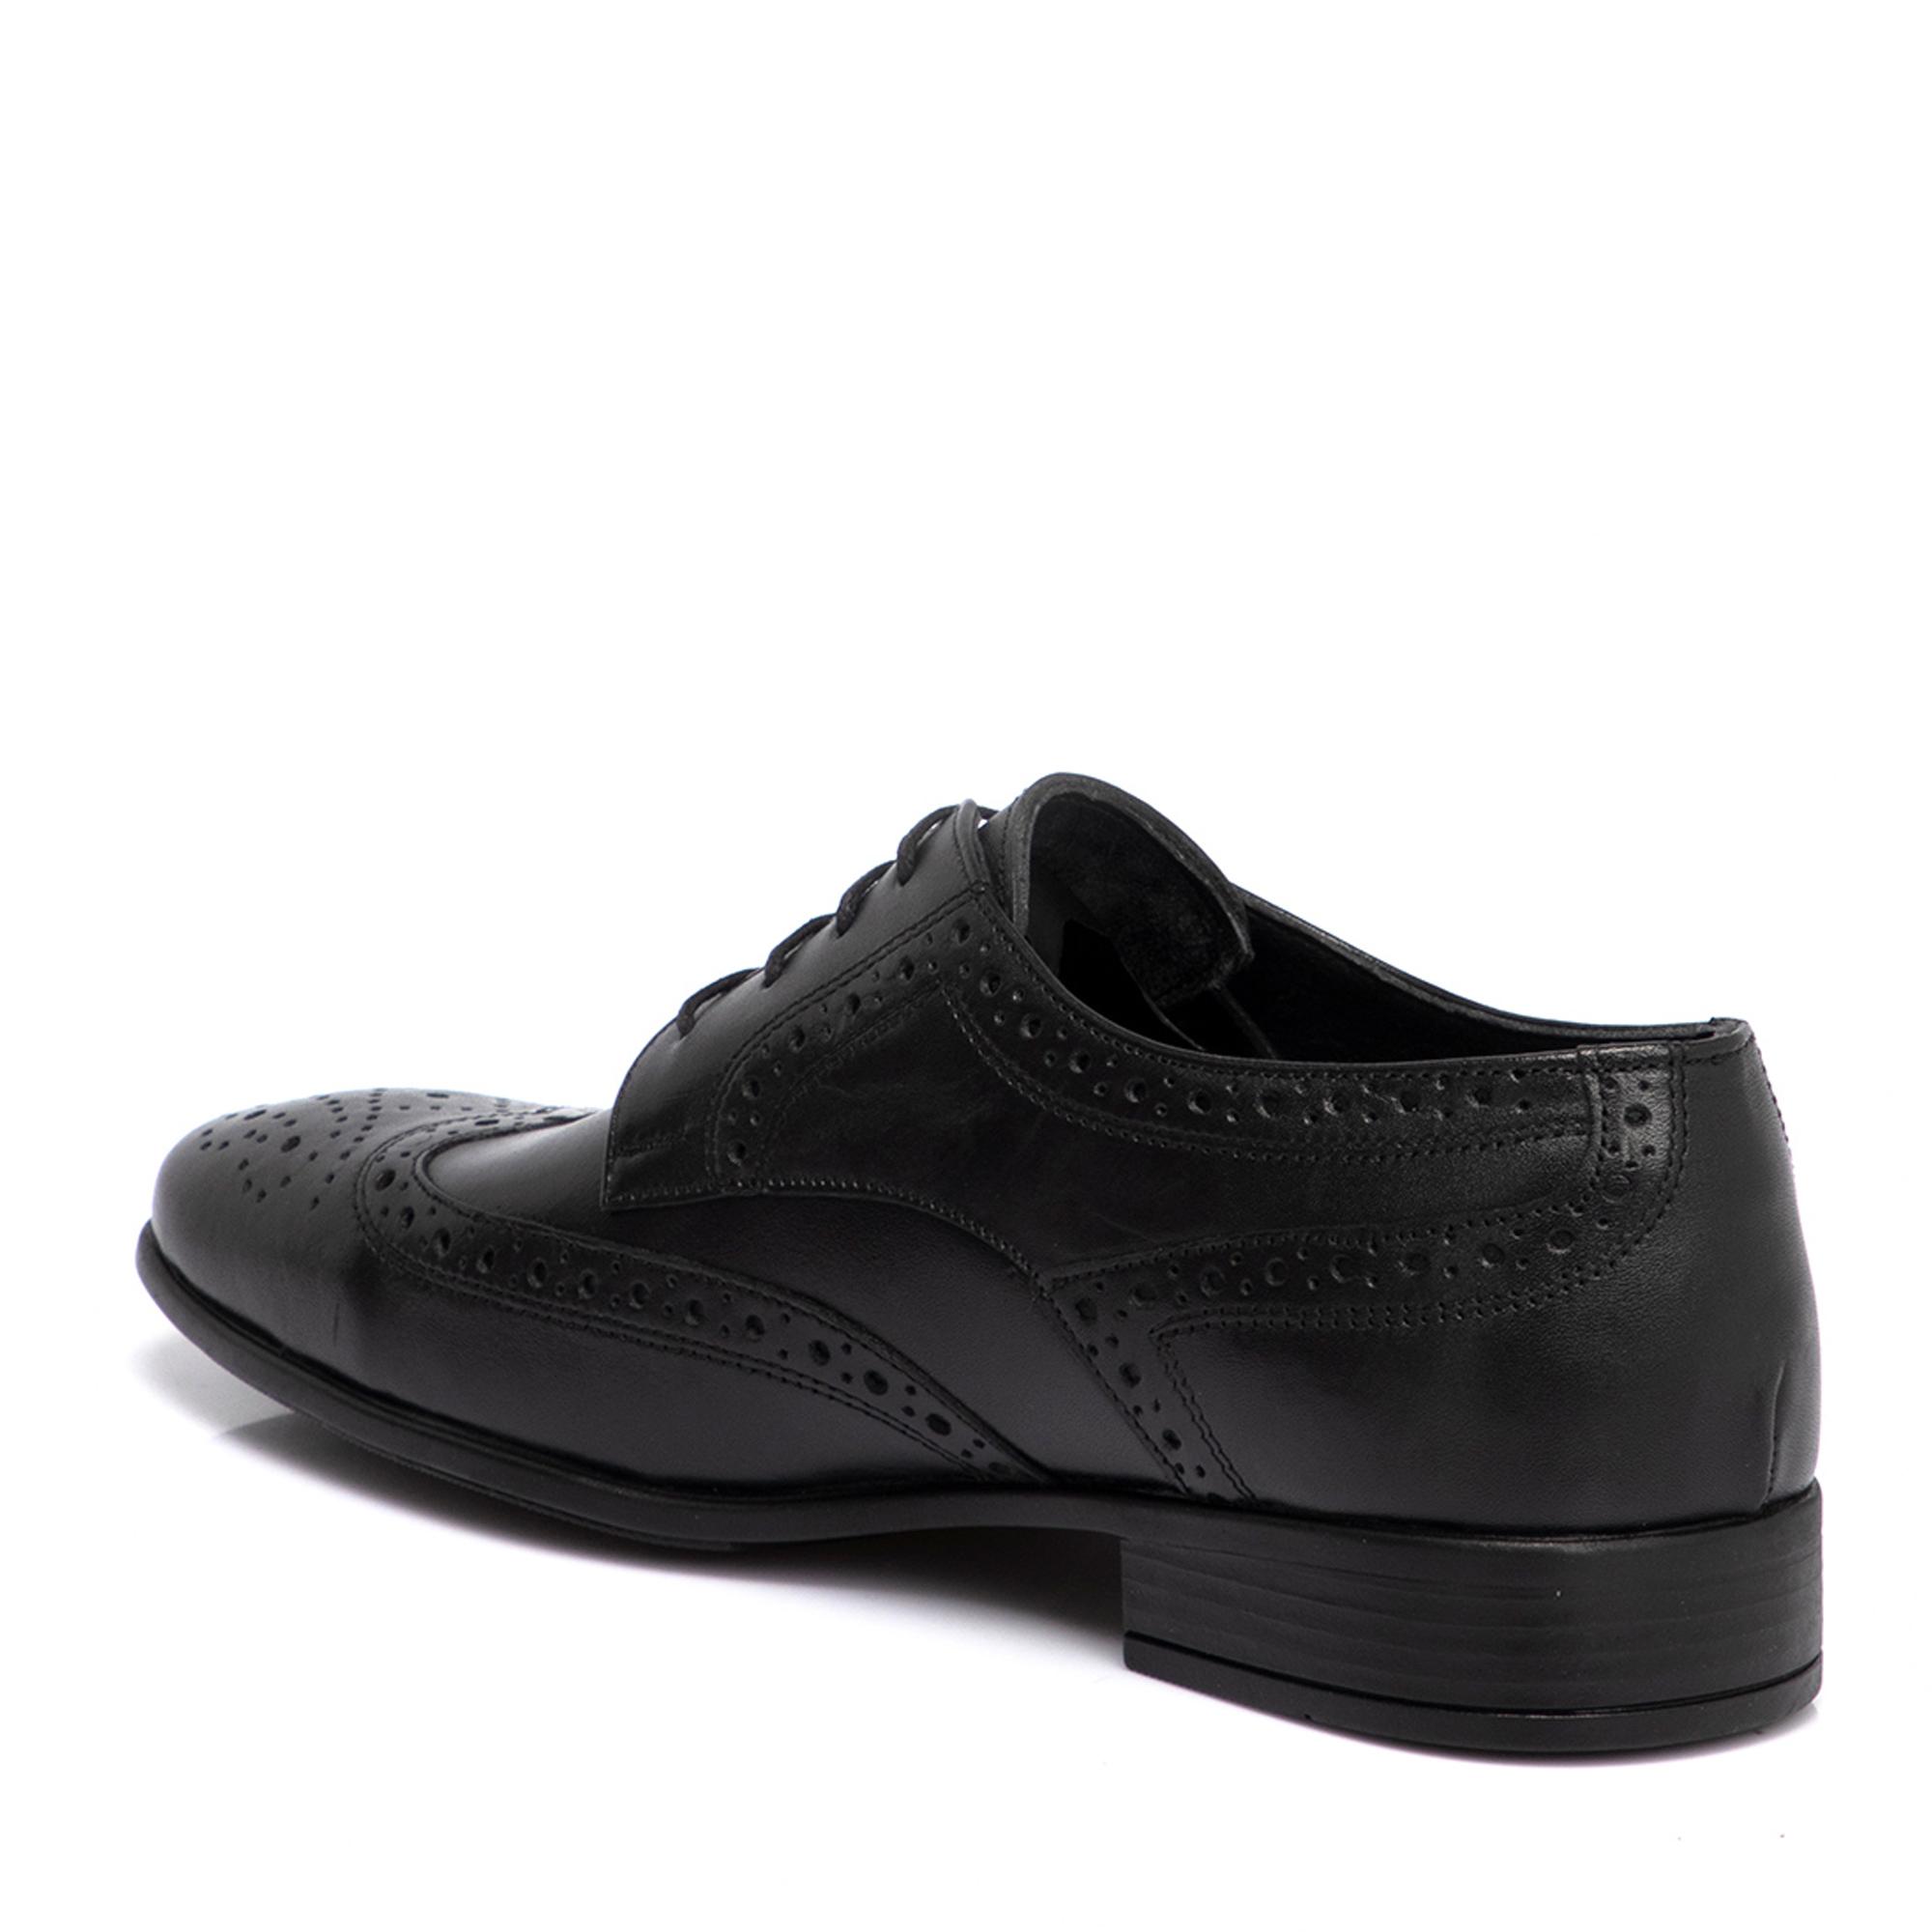 Siyah Deri Erkek Ayakkabı 54379A23